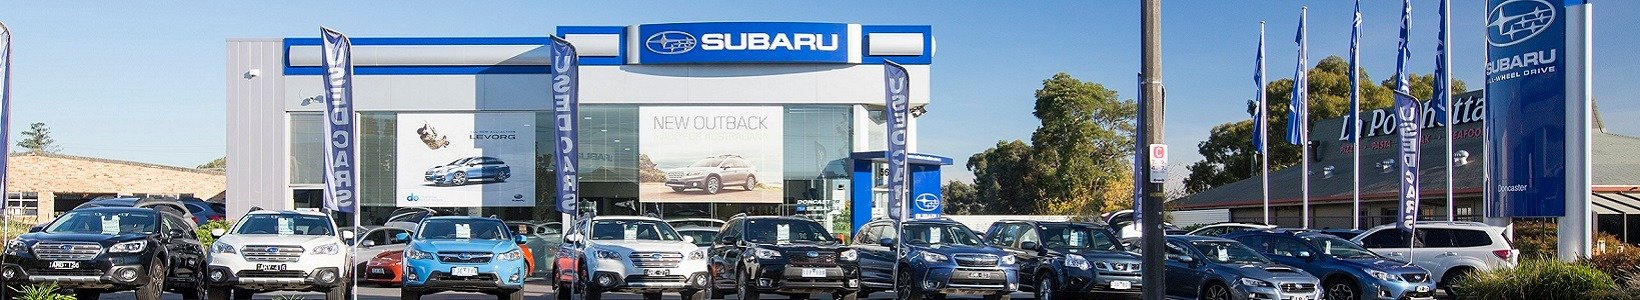 Subaru Doncaster